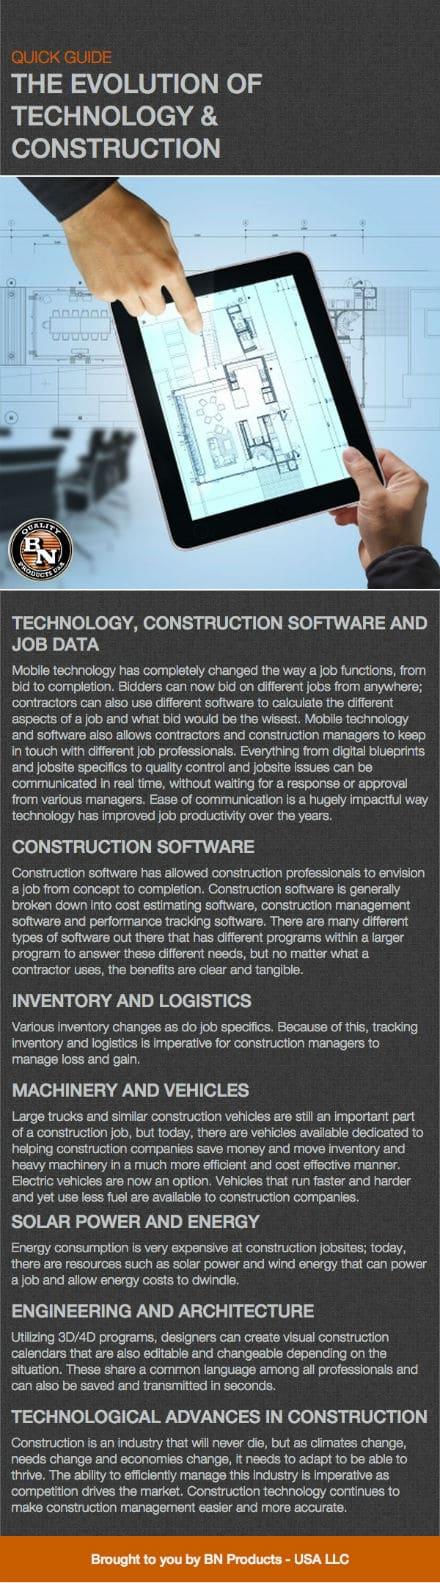 evolution of technology & construction